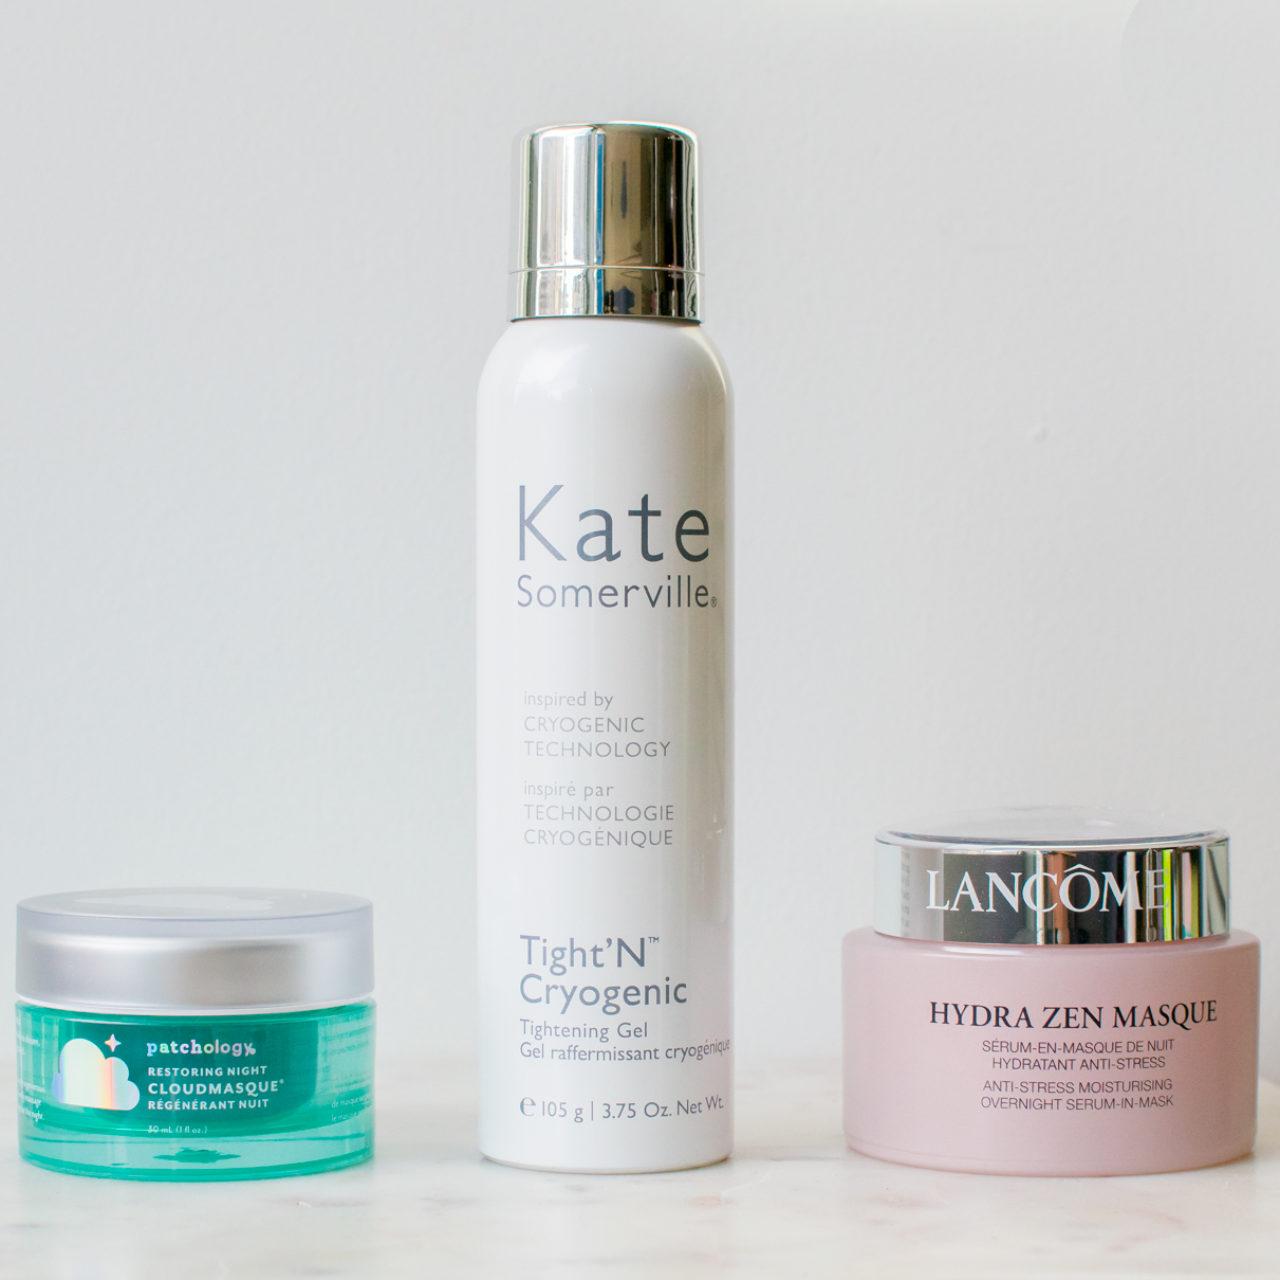 Beauty Finds – Some Skin Care Updates – Kate Somerville Tight'N Cryogenic Tightening Gel, Lancôme Hydra Zen Night Masque, Patchology Restoring Night CloudMasque® Night Cream